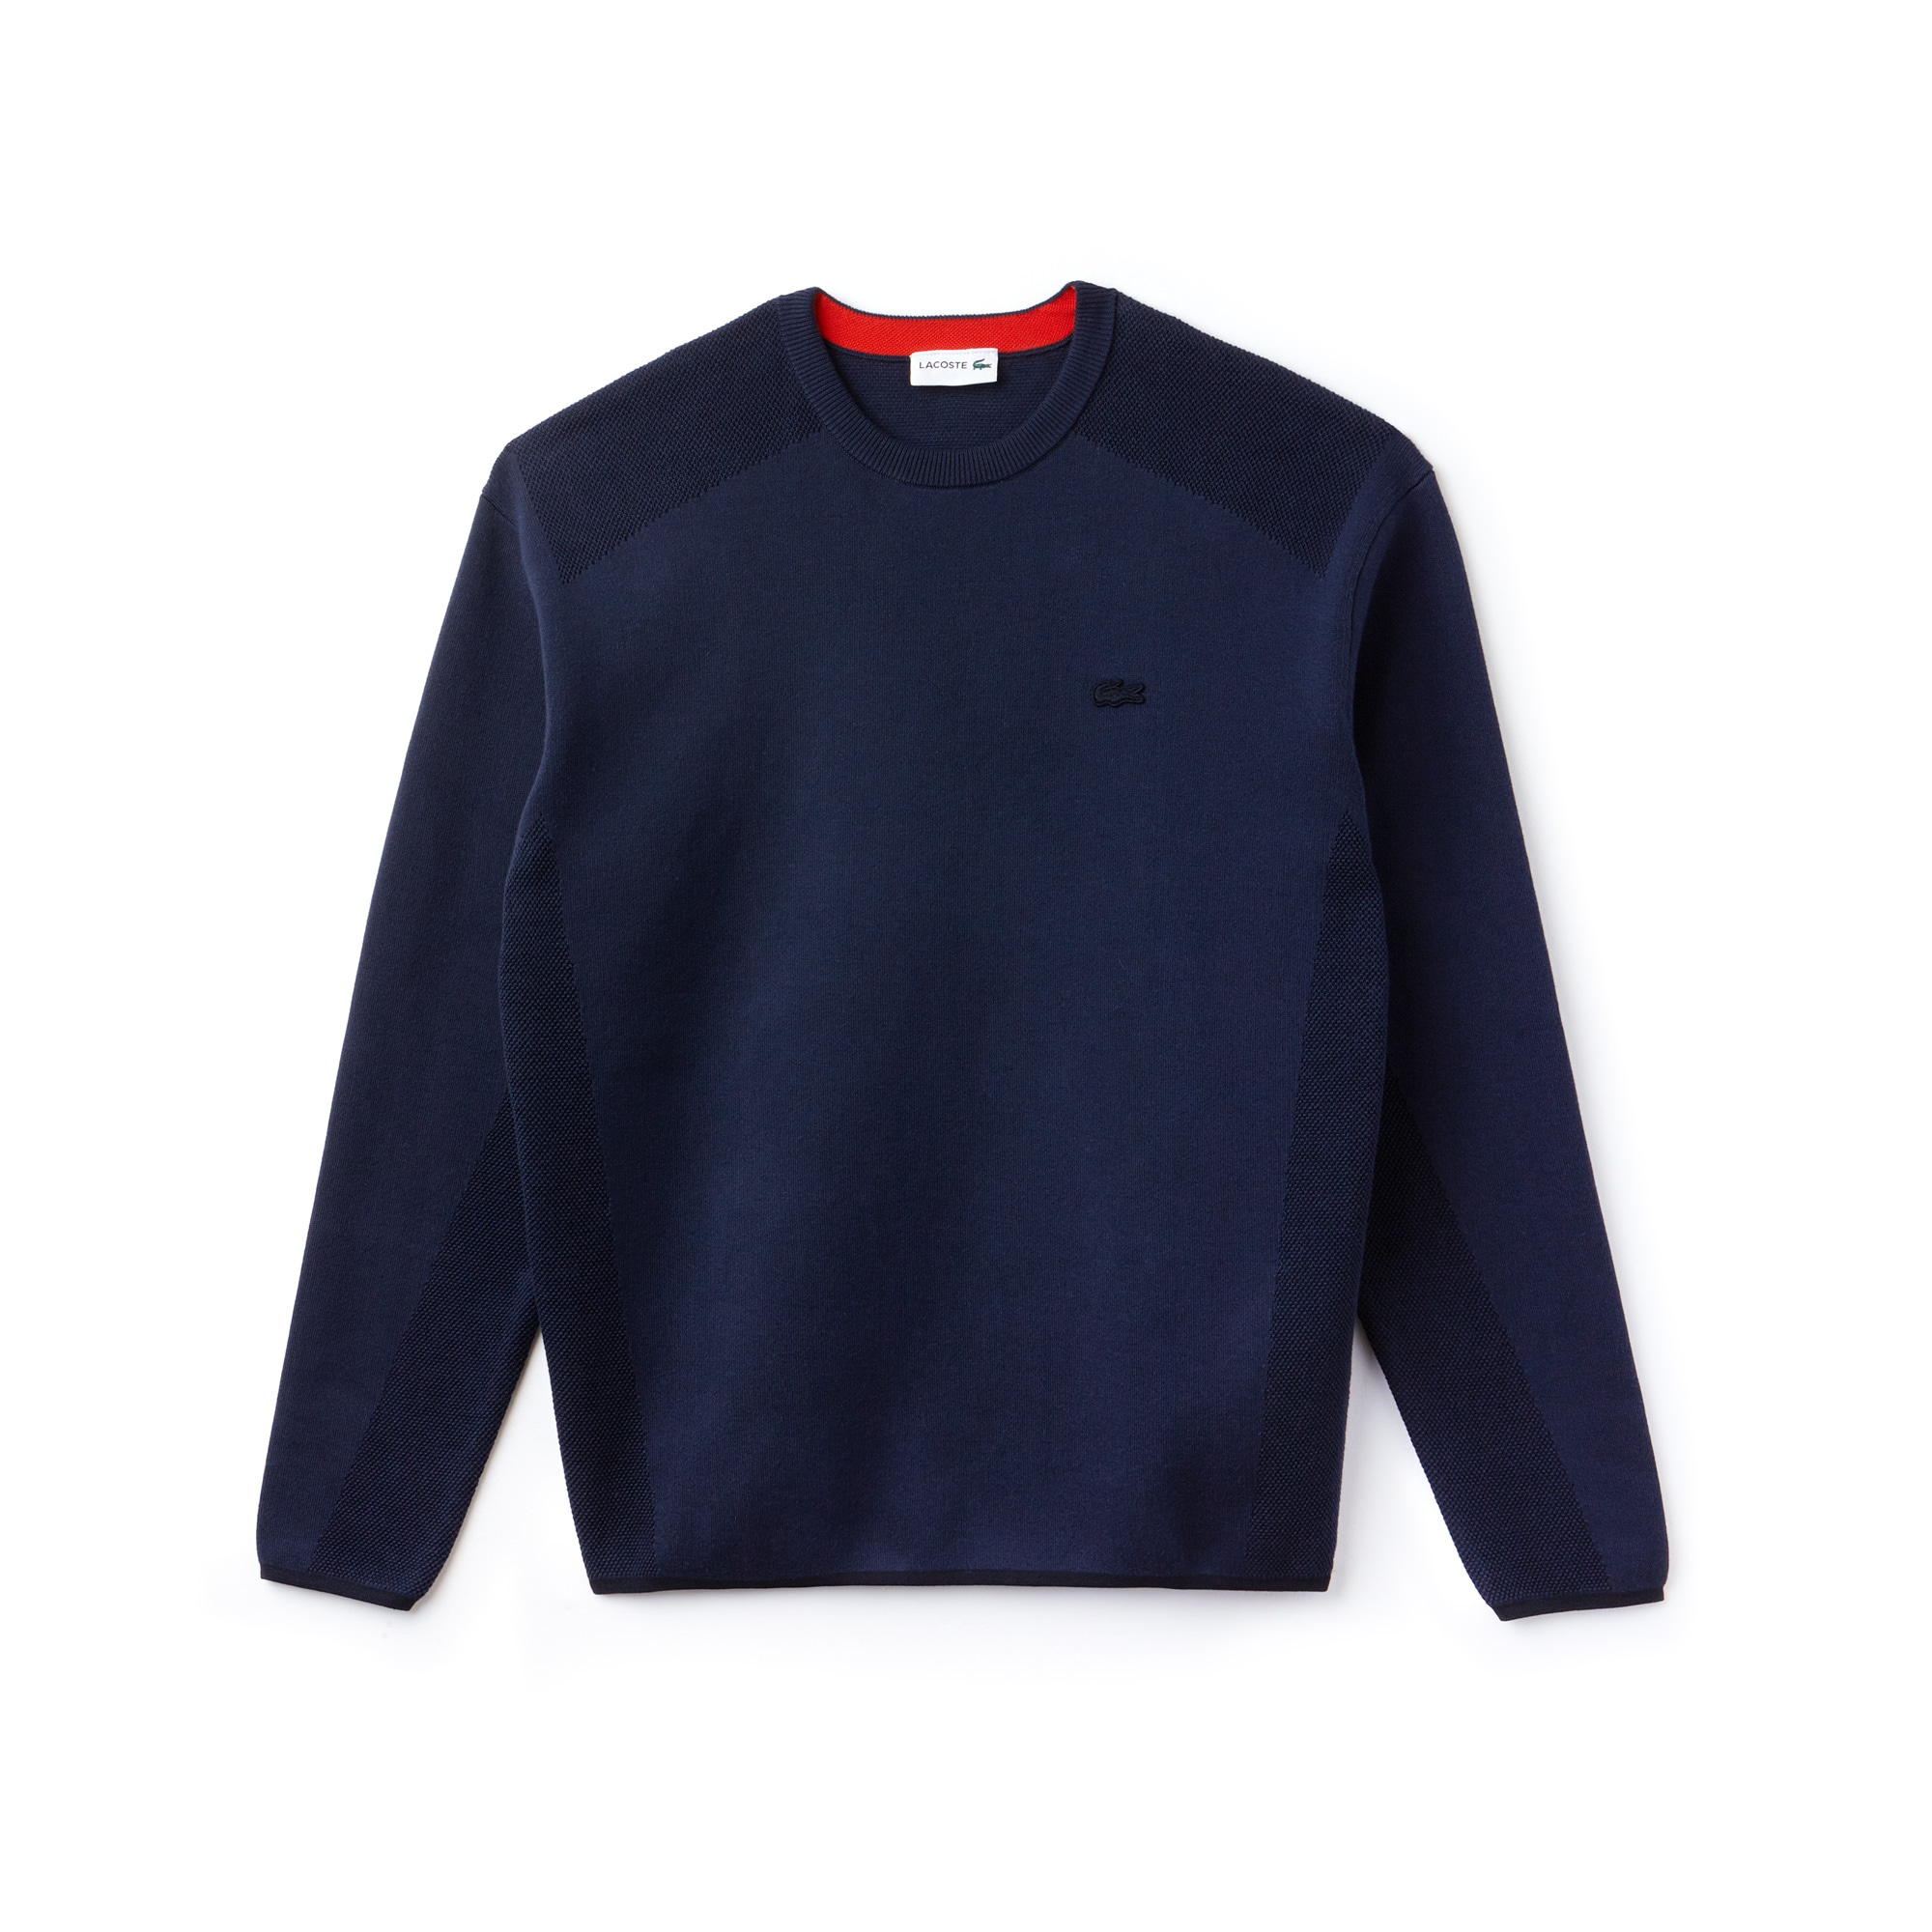 Men's Motion Crew Neck Coolmax Cotton Sweater